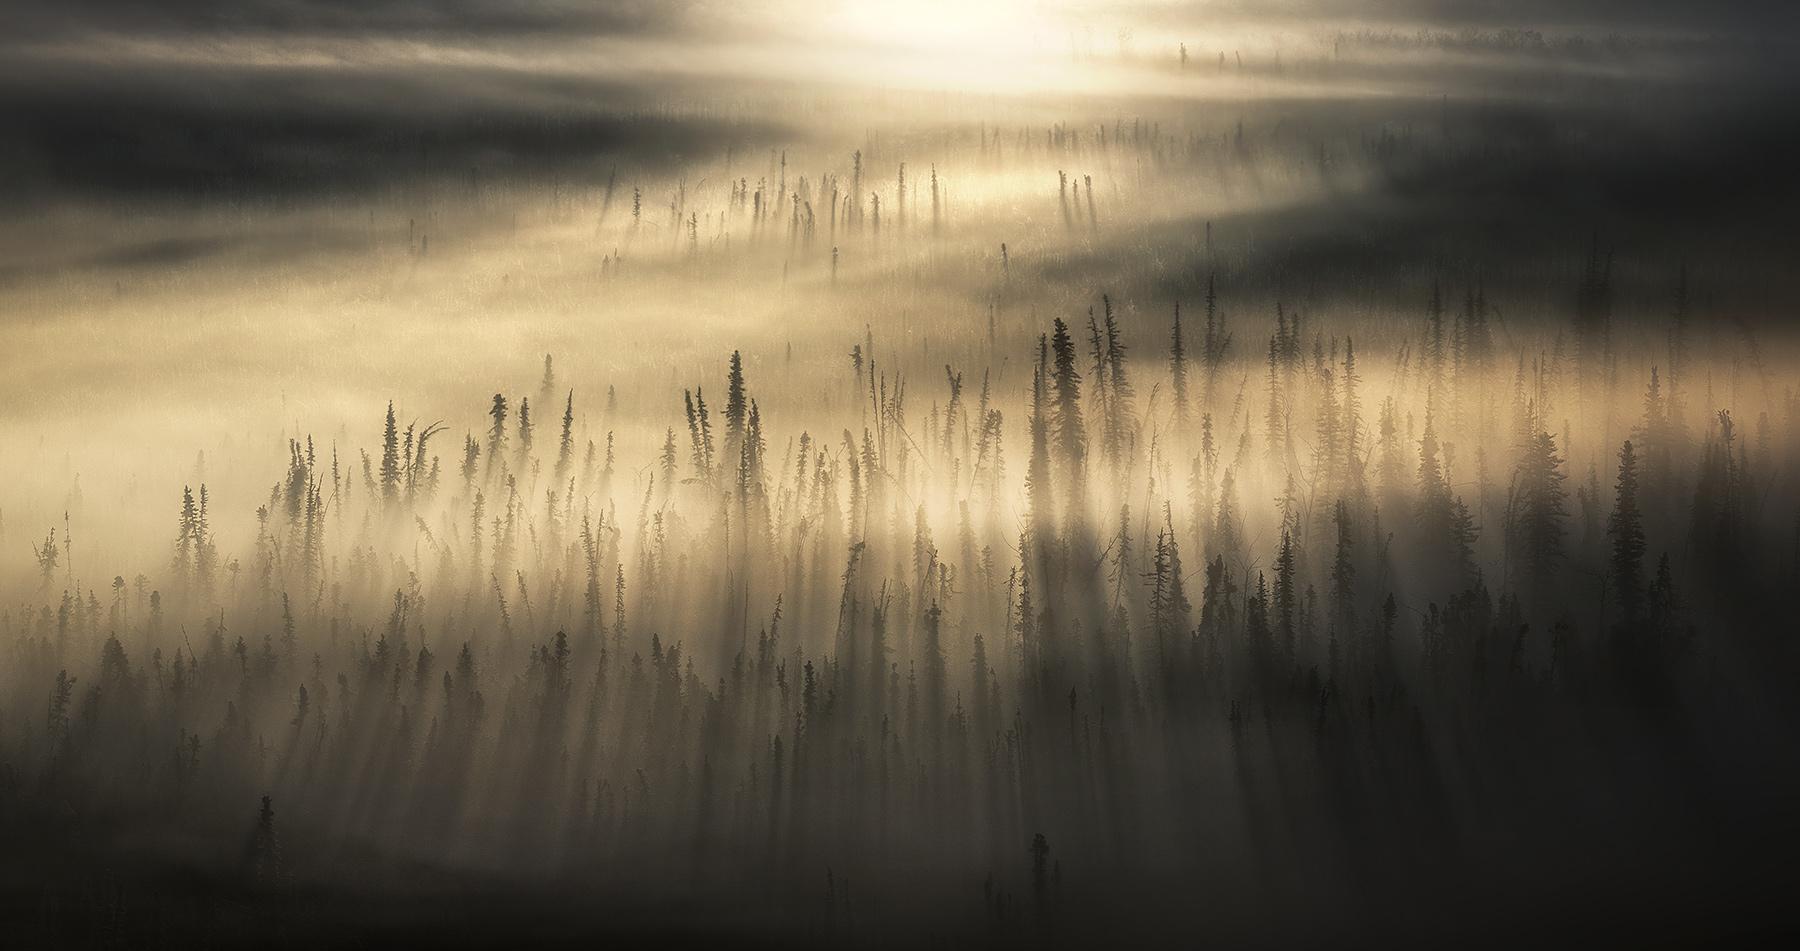 light beams, sunbeam, forest, boreal, Yukon, sunrise, fog, fog beam, god beam, photo